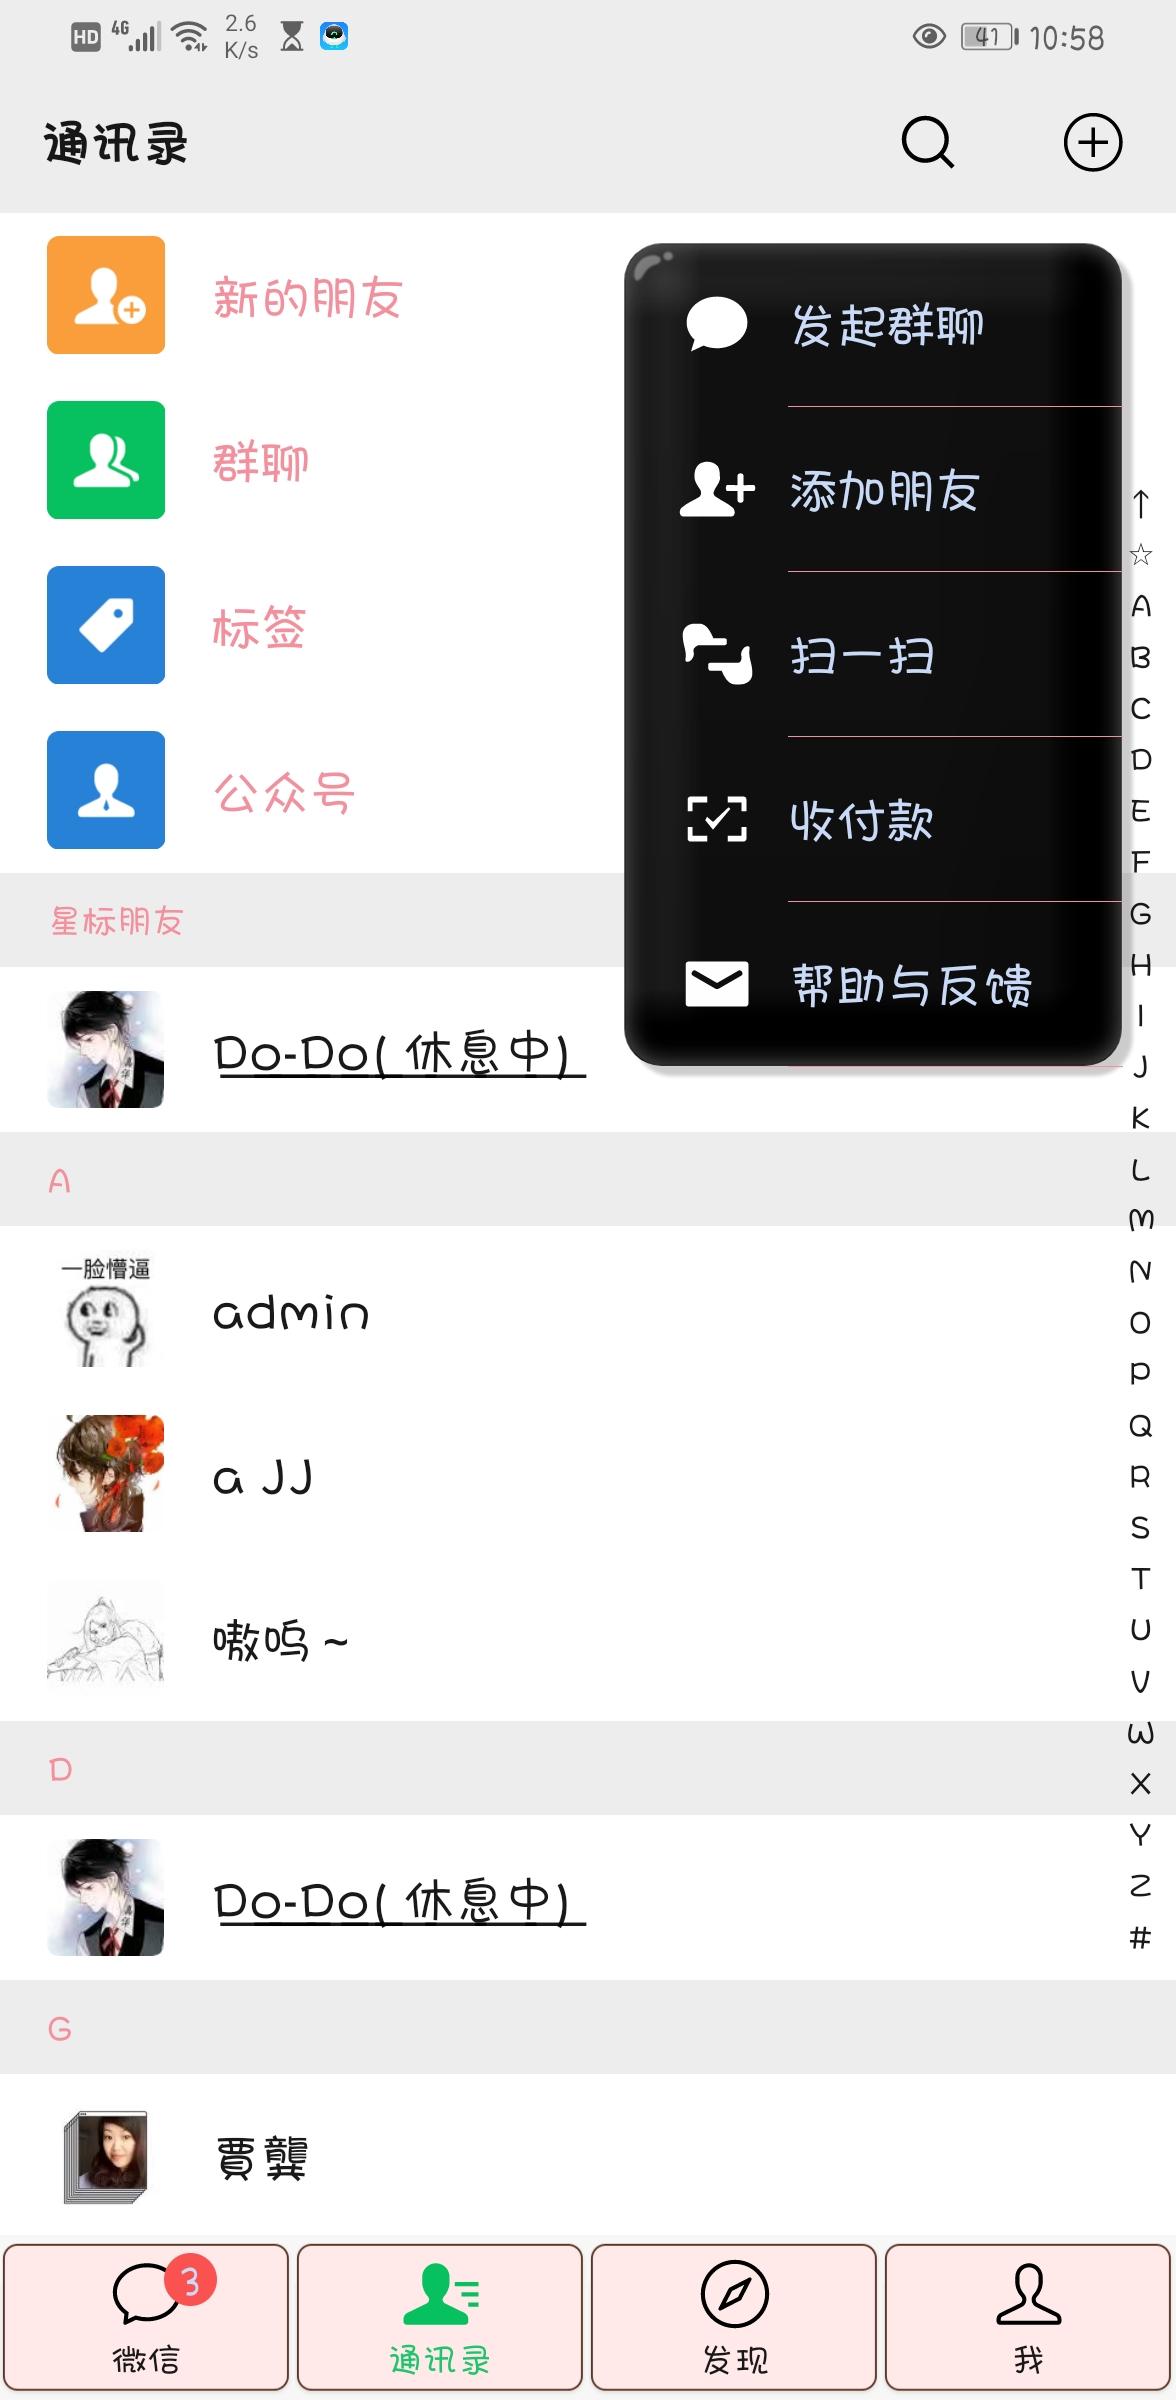 Screenshot_20200406_105837_com.tencent.mm.jpg